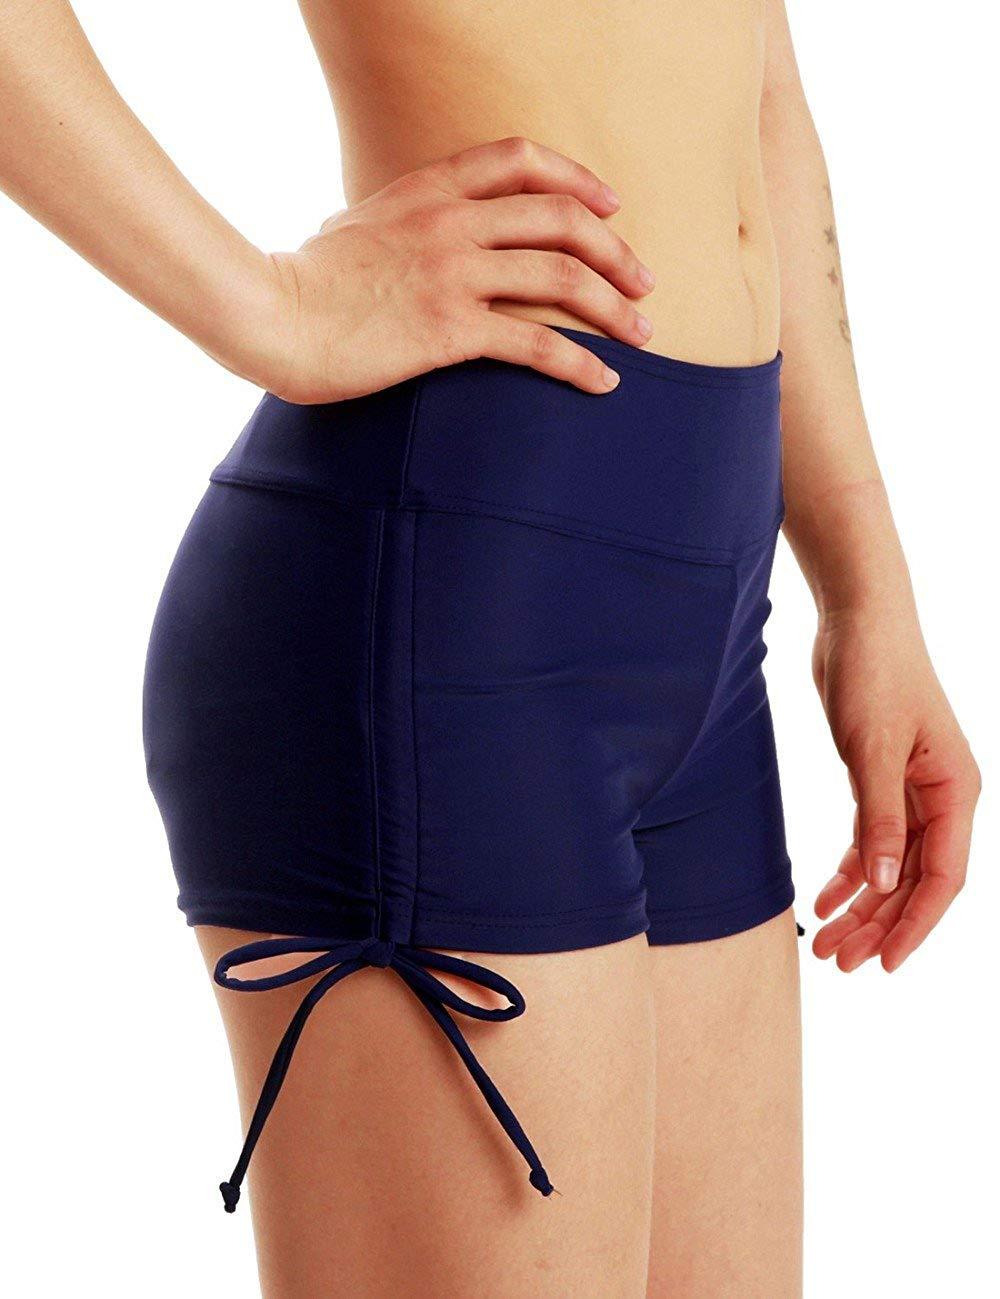 86ee30af88de Raisins Women's Red Boy Shorts Crazy Low Hipster Hoop Detail Bikini Swim  Bottom. Get Quotations · Mycoco Women's Boy Leg Swim Bottom Drawstring Boy  Shorts ...